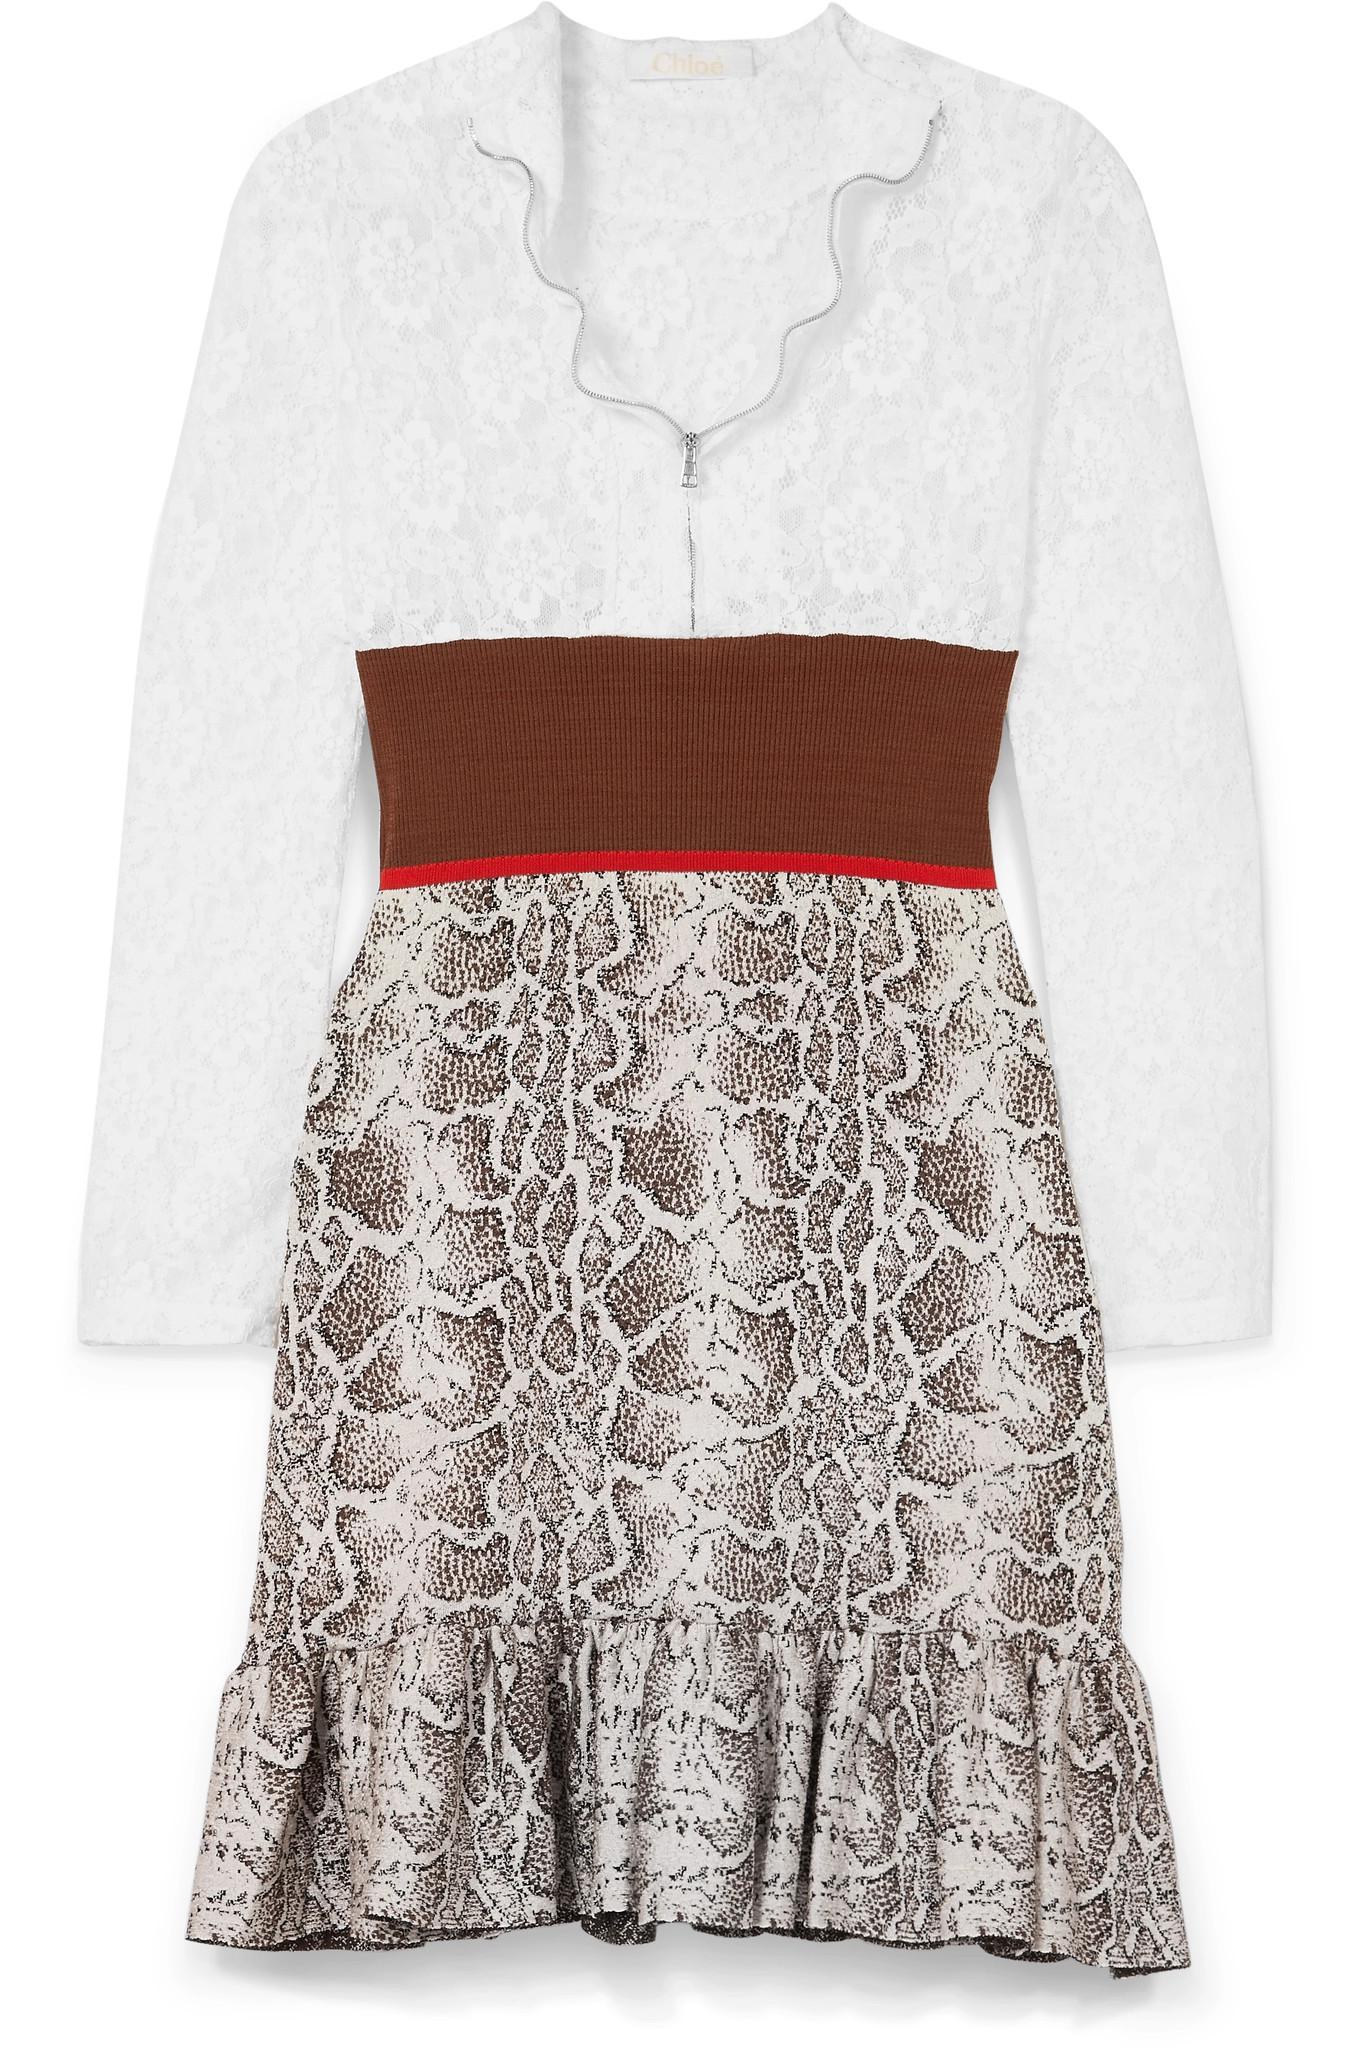 Paneled Lace, Stretch And Jacquard-knit Mini Dress - Brown Chlo